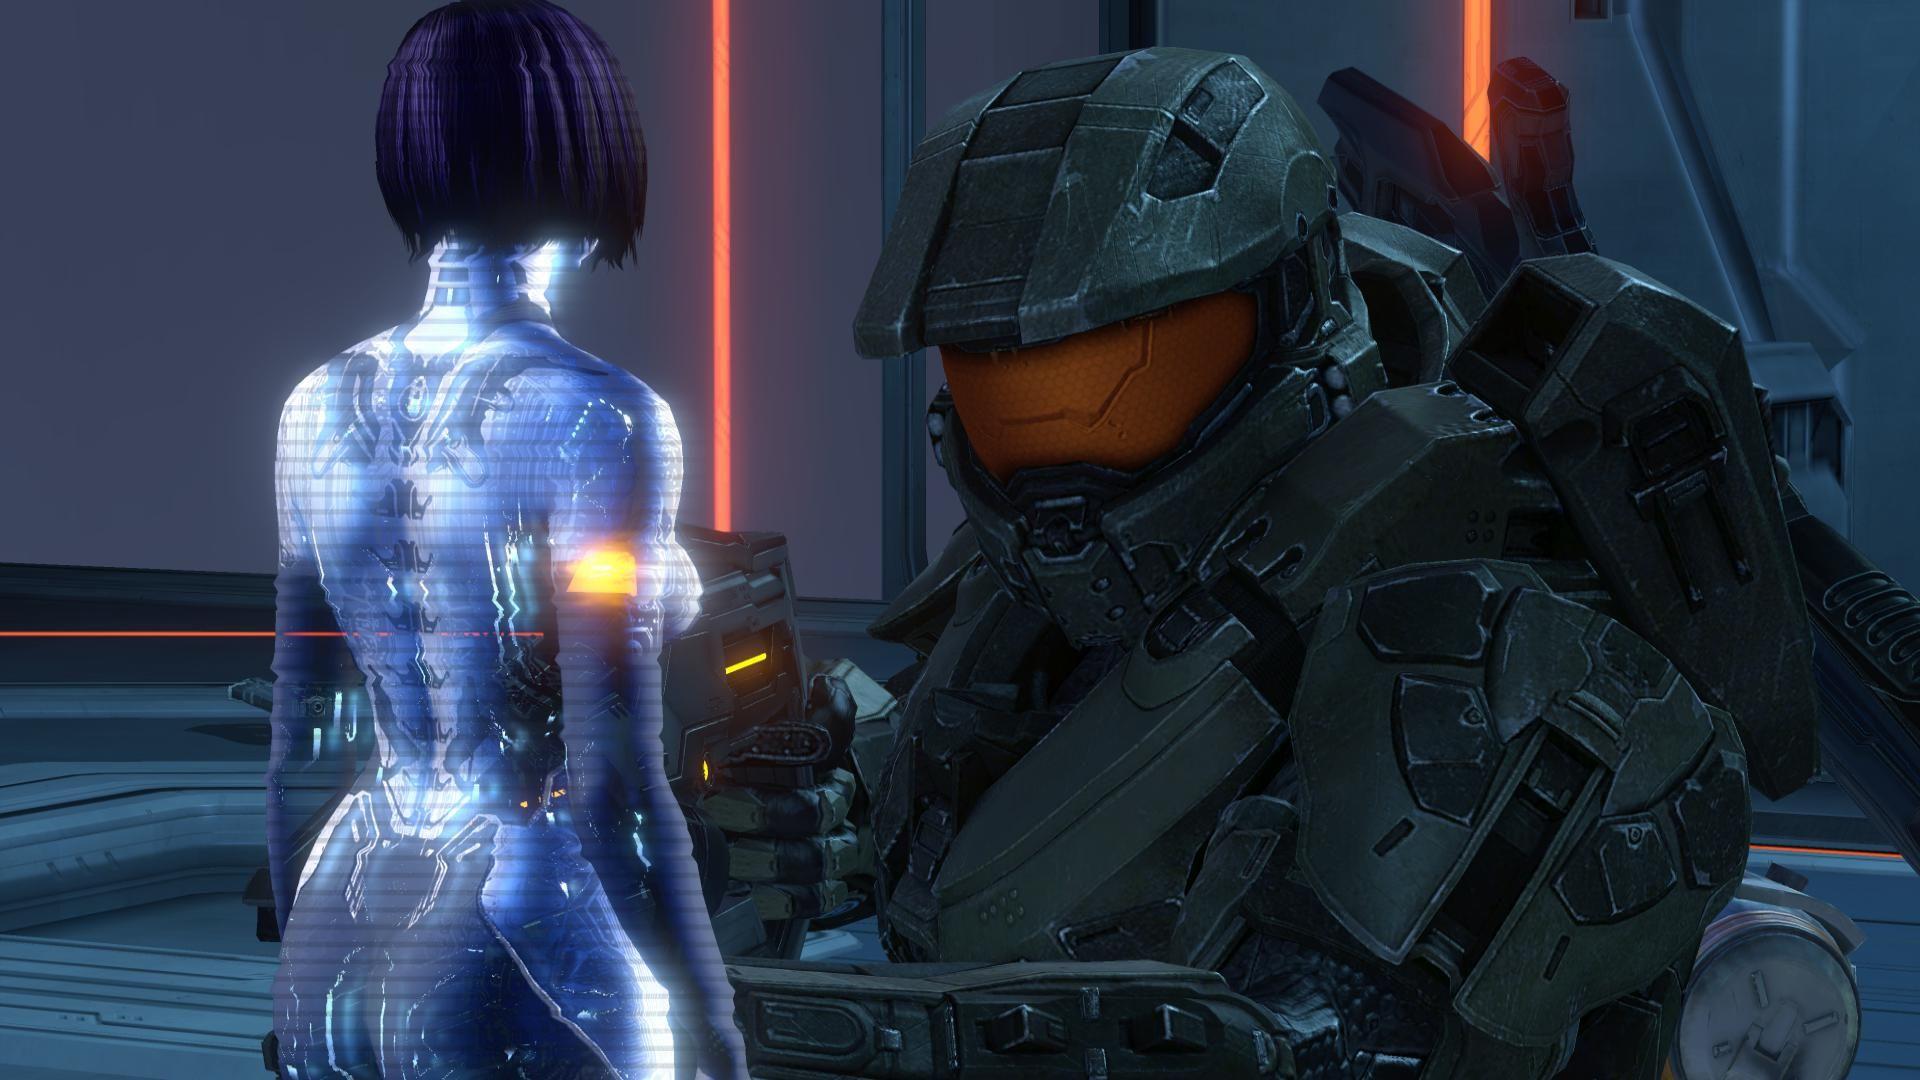 John-117 & Cortana in Halo 4 | halo | Halo, Master chief, Video games